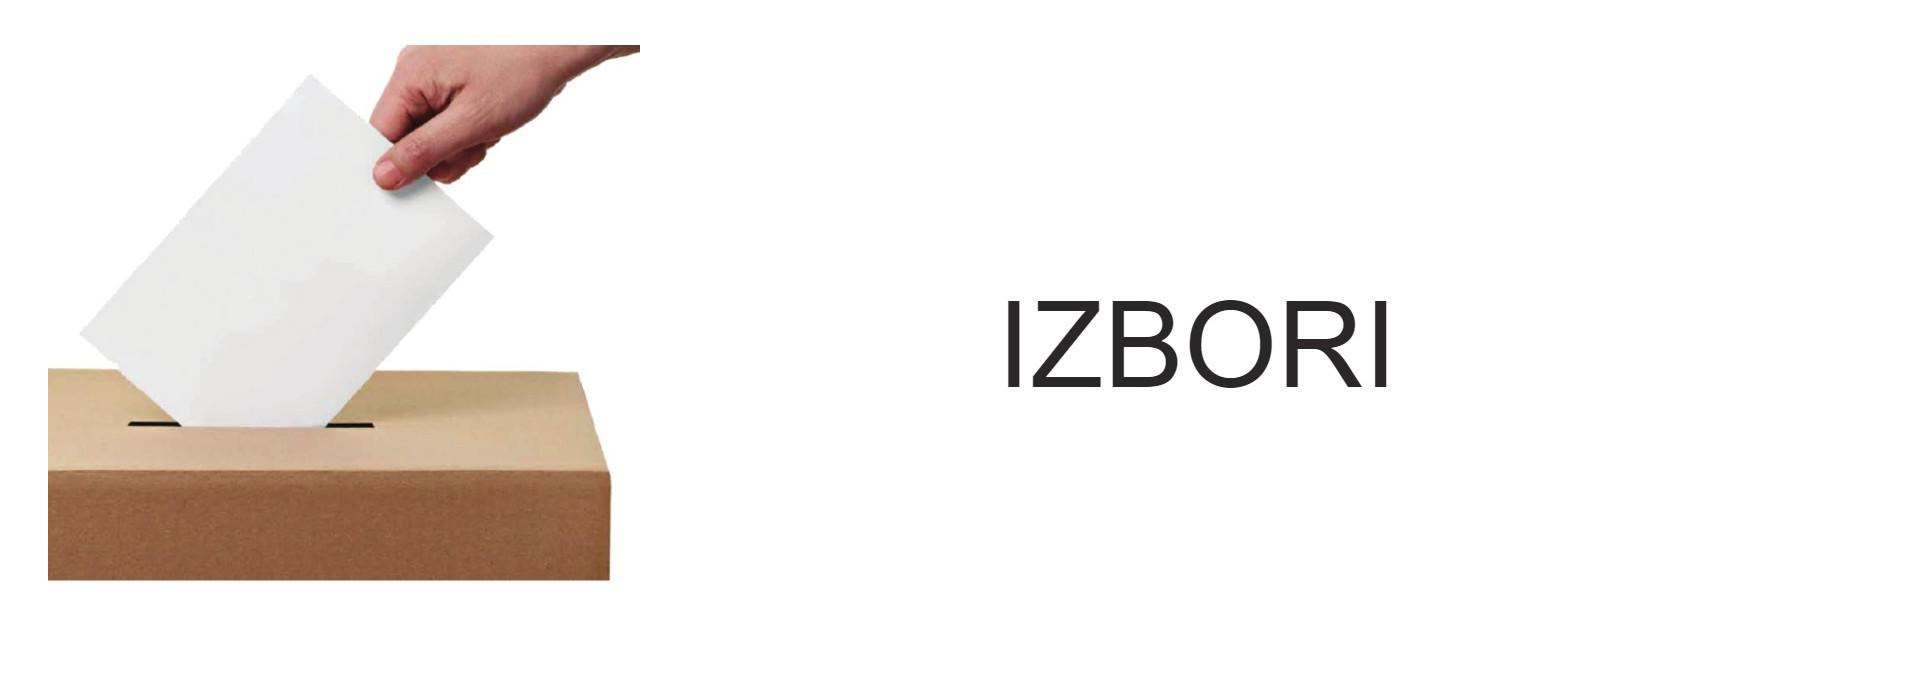 izbori banner